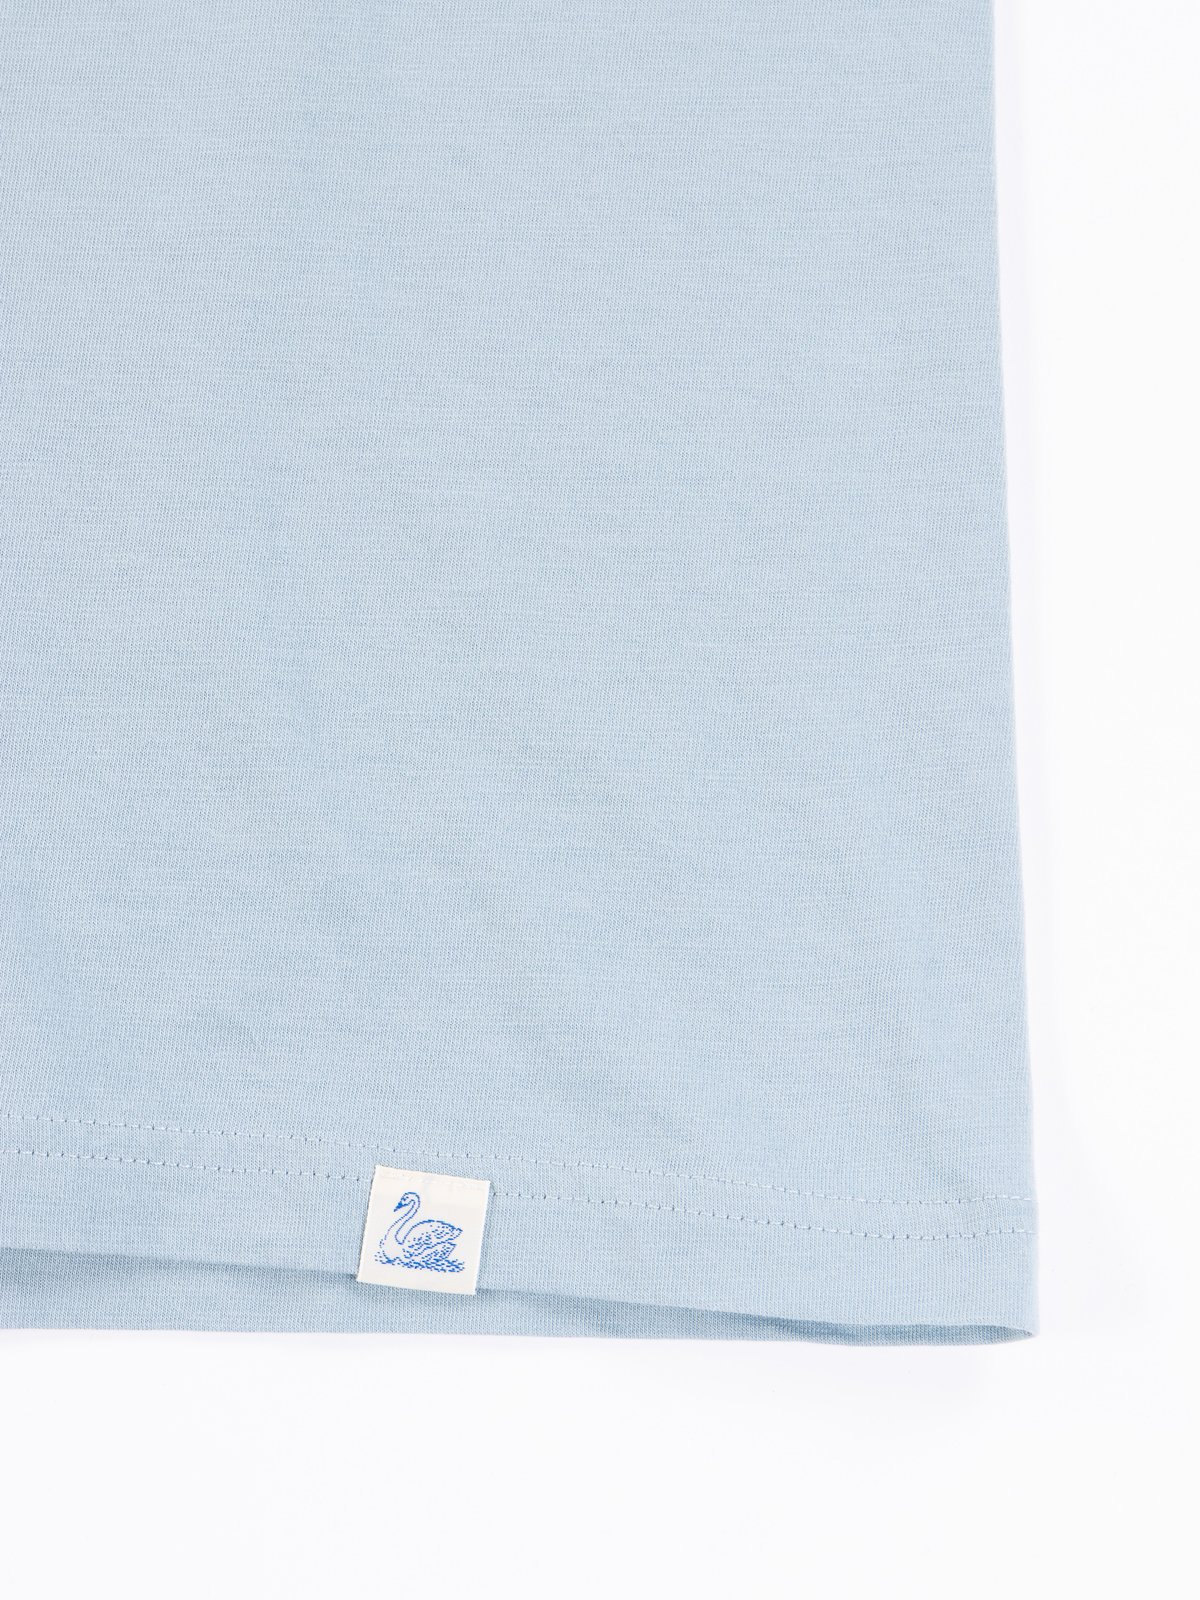 Pale Blue Good Basics CTP01 Pocket Crew Neck Tee - Image 5